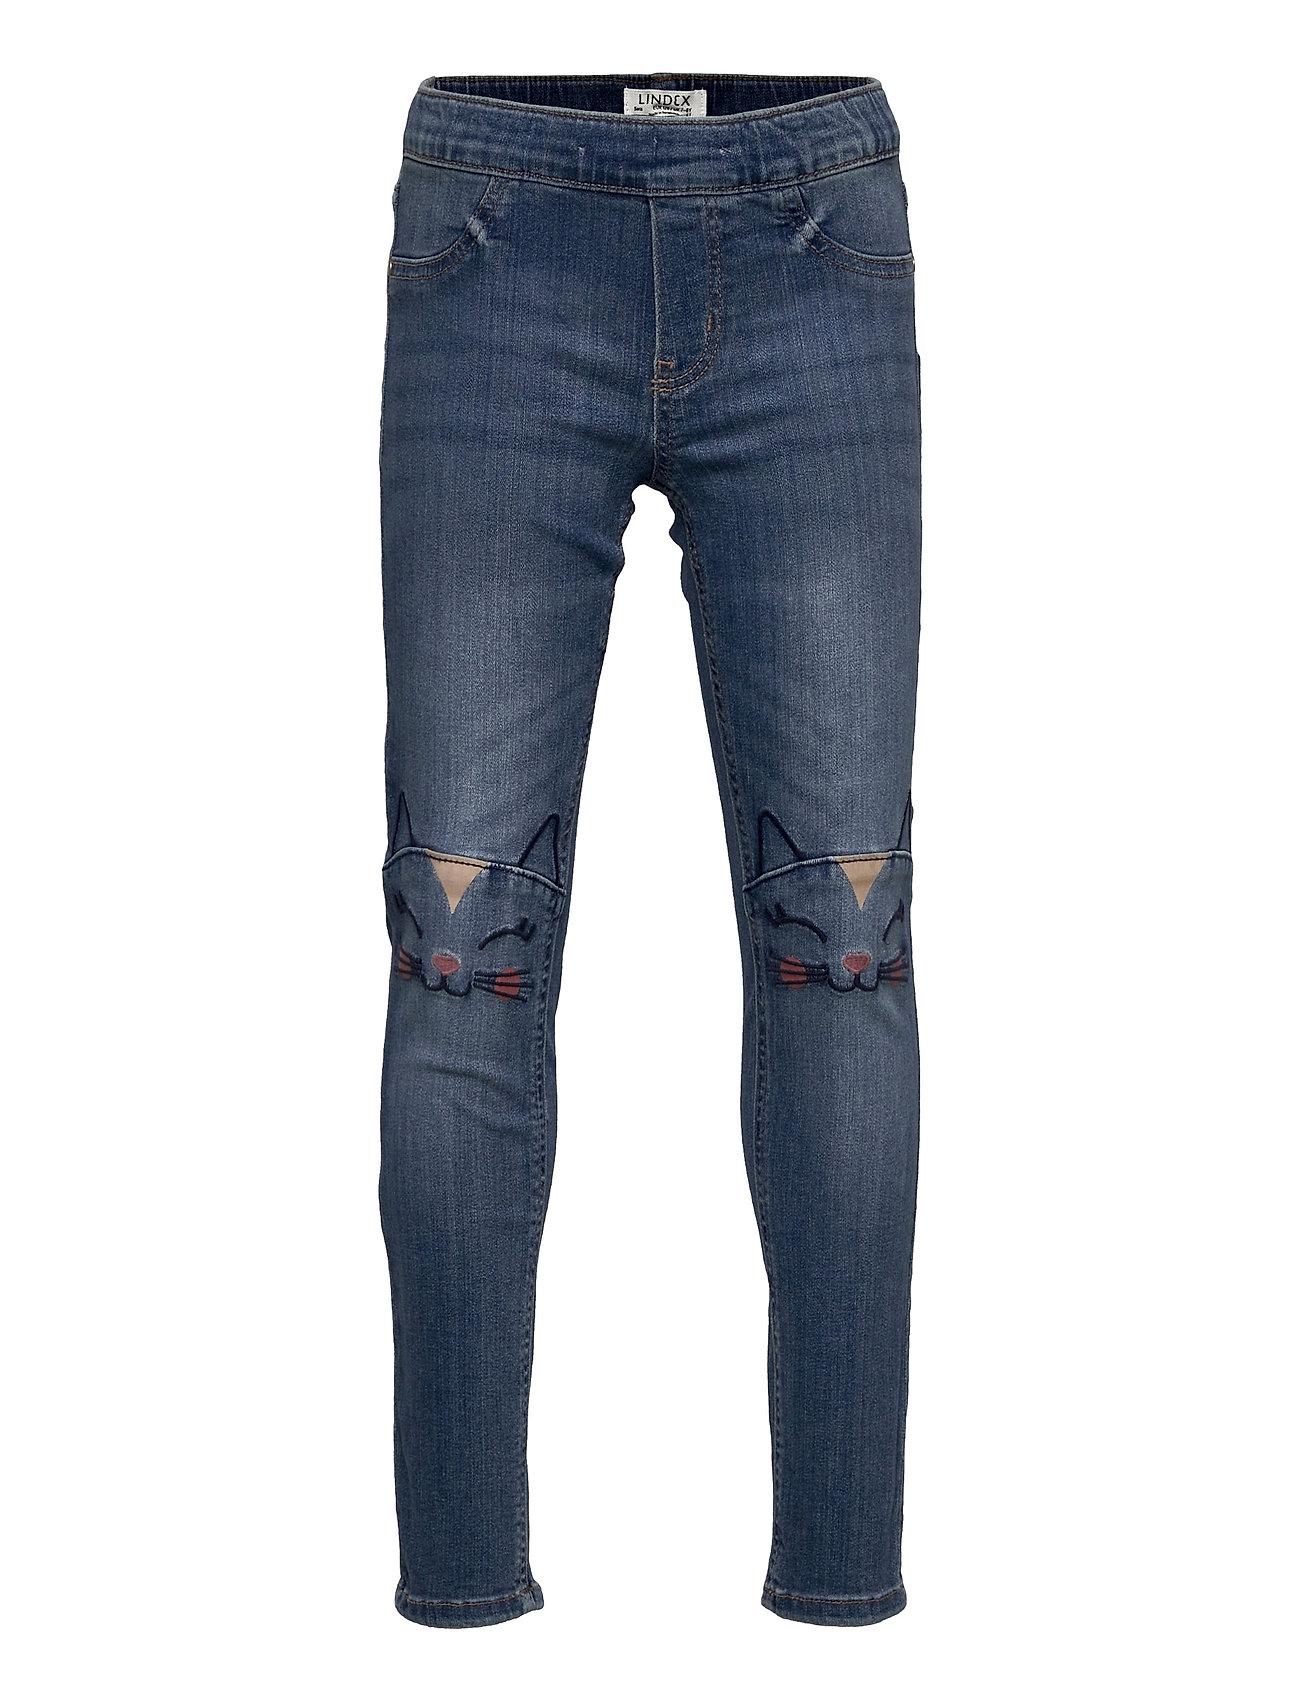 Trousers Denim Sara Playful Jeans Blå Lindex